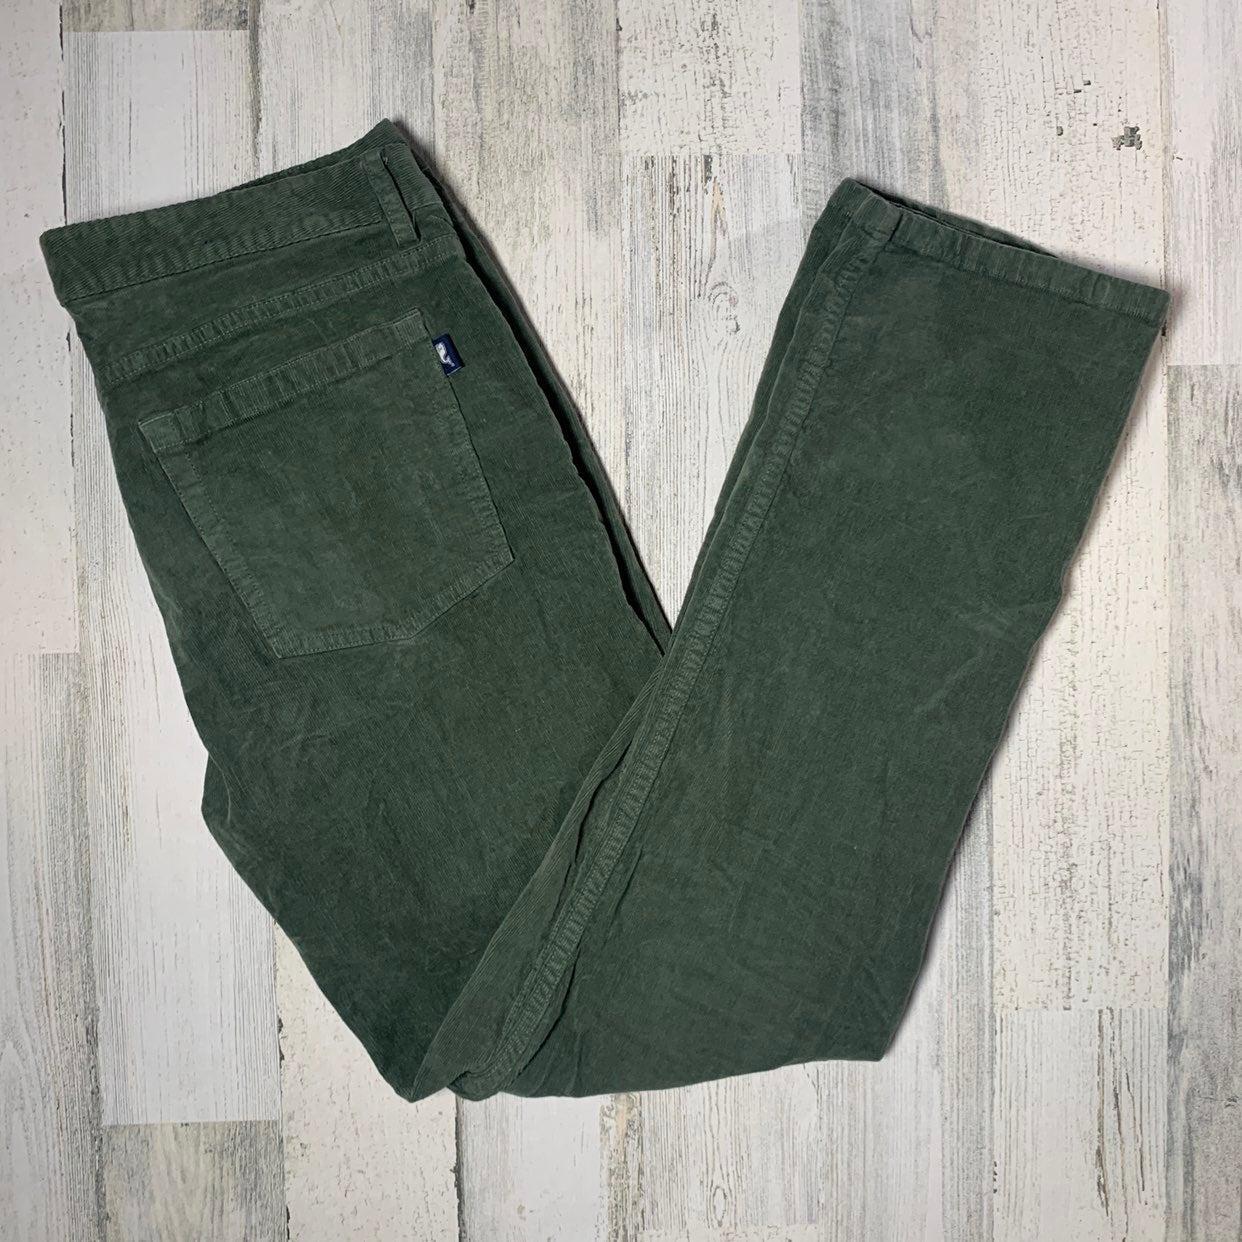 Grey Vineyard Vines Mens Five Pocket Cords Casual Corduroy Pants 40W x 32L